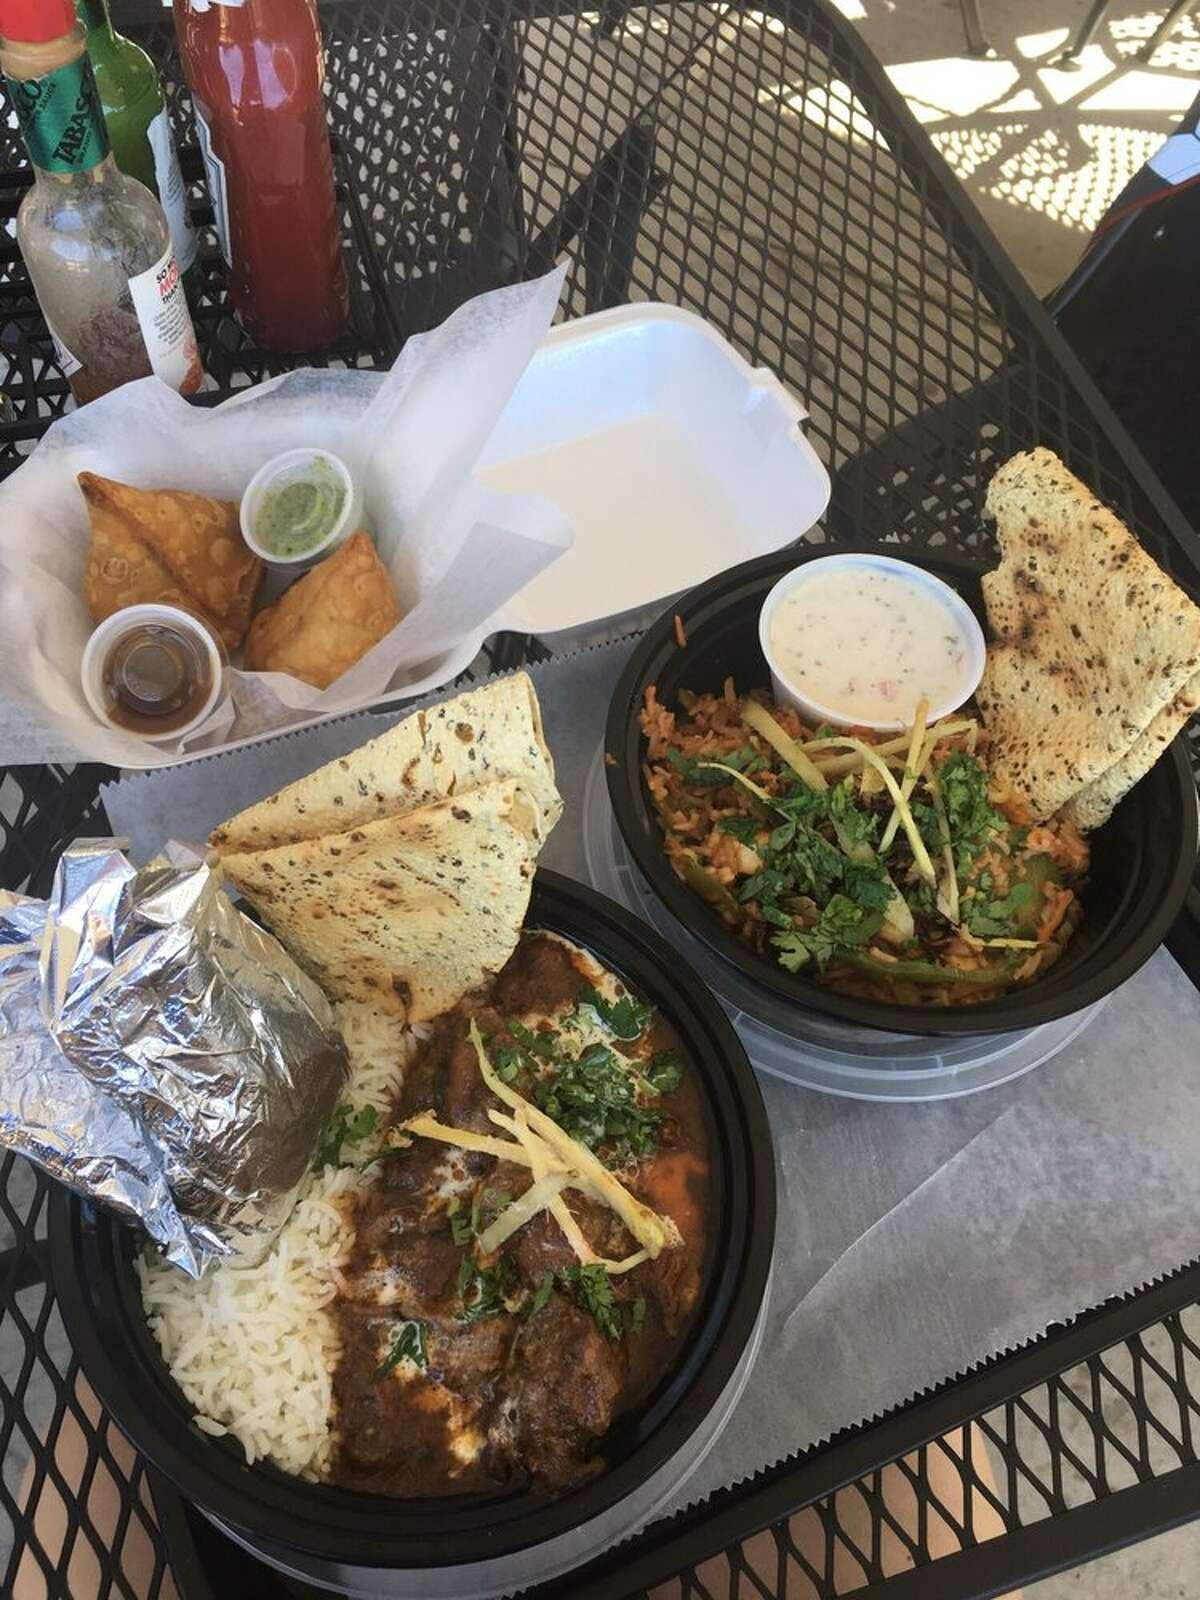 AmarilloIt's a Punjabi Affair Yelp rating: 5 stars Address: 4201 Bushland Blvd, Amarillo, TX 79106 Photo: Stephenie T./Yelp